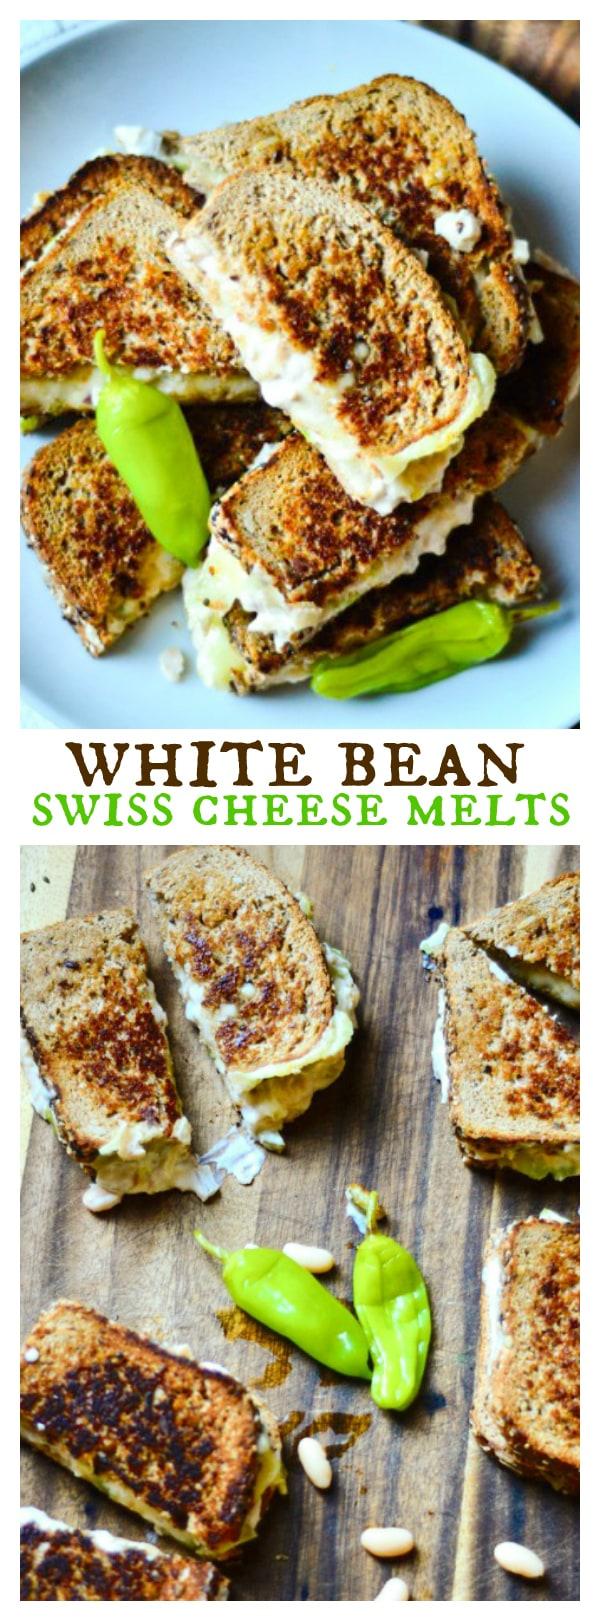 White Bean Swiss Cheese Melts